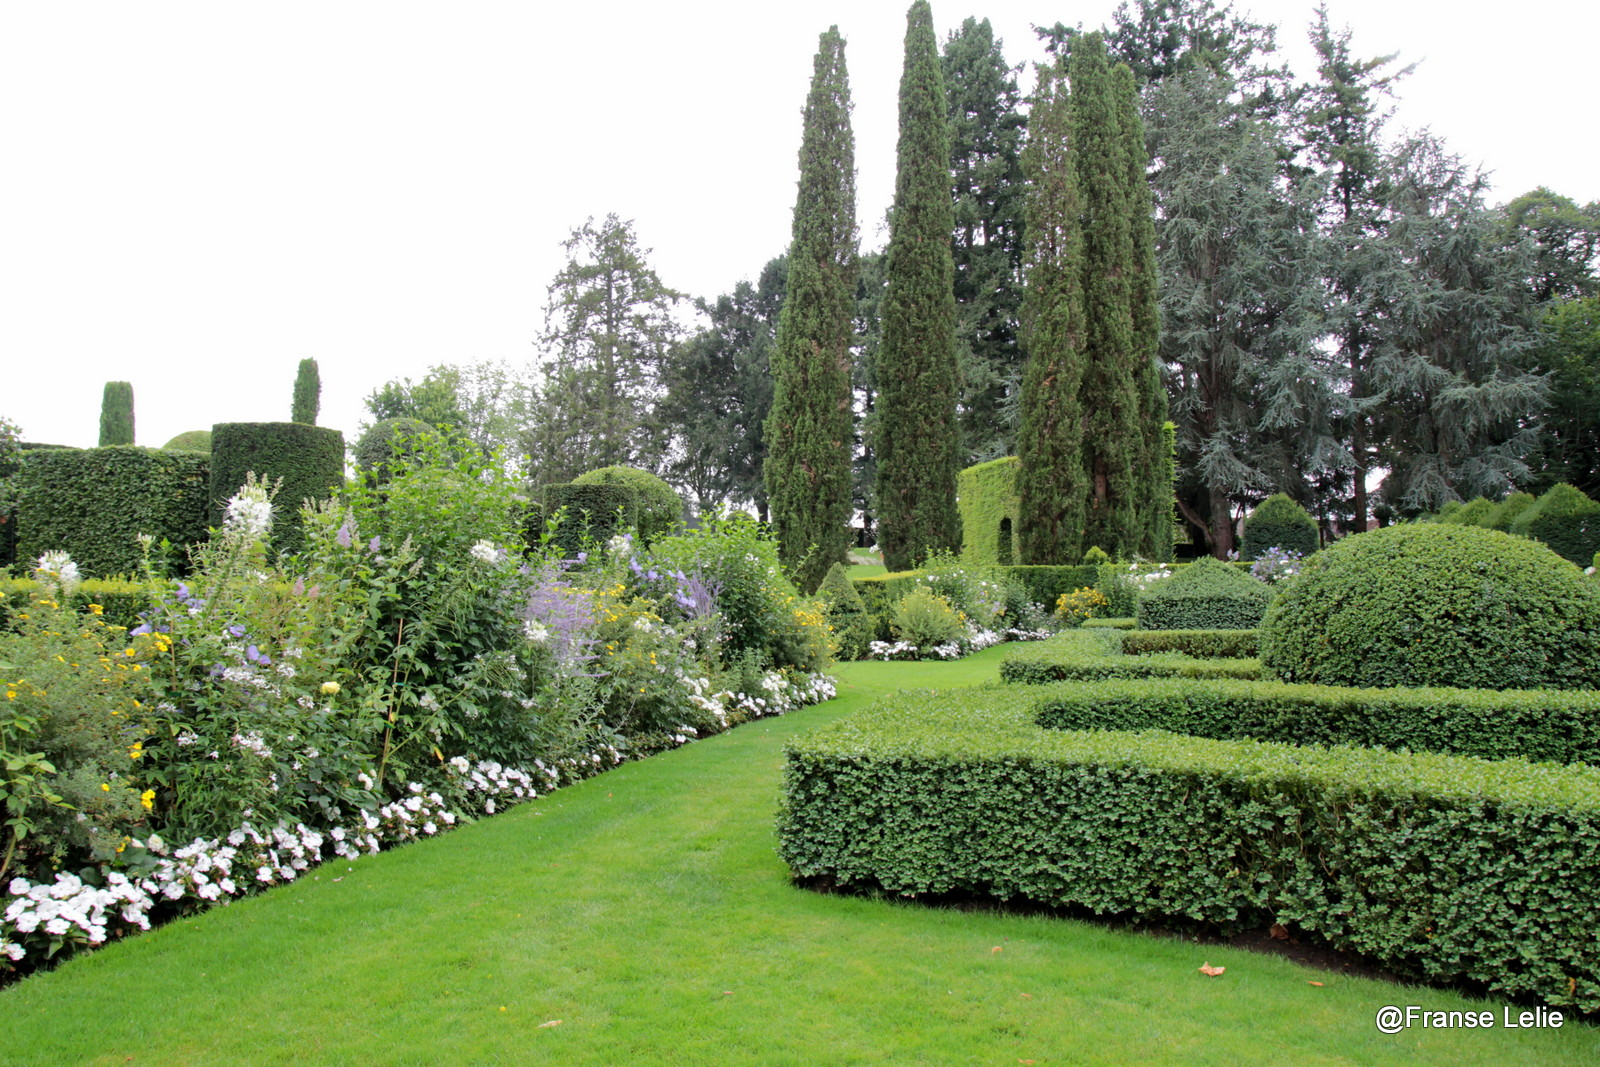 Franse lelie wat een tuin for Franse tuin